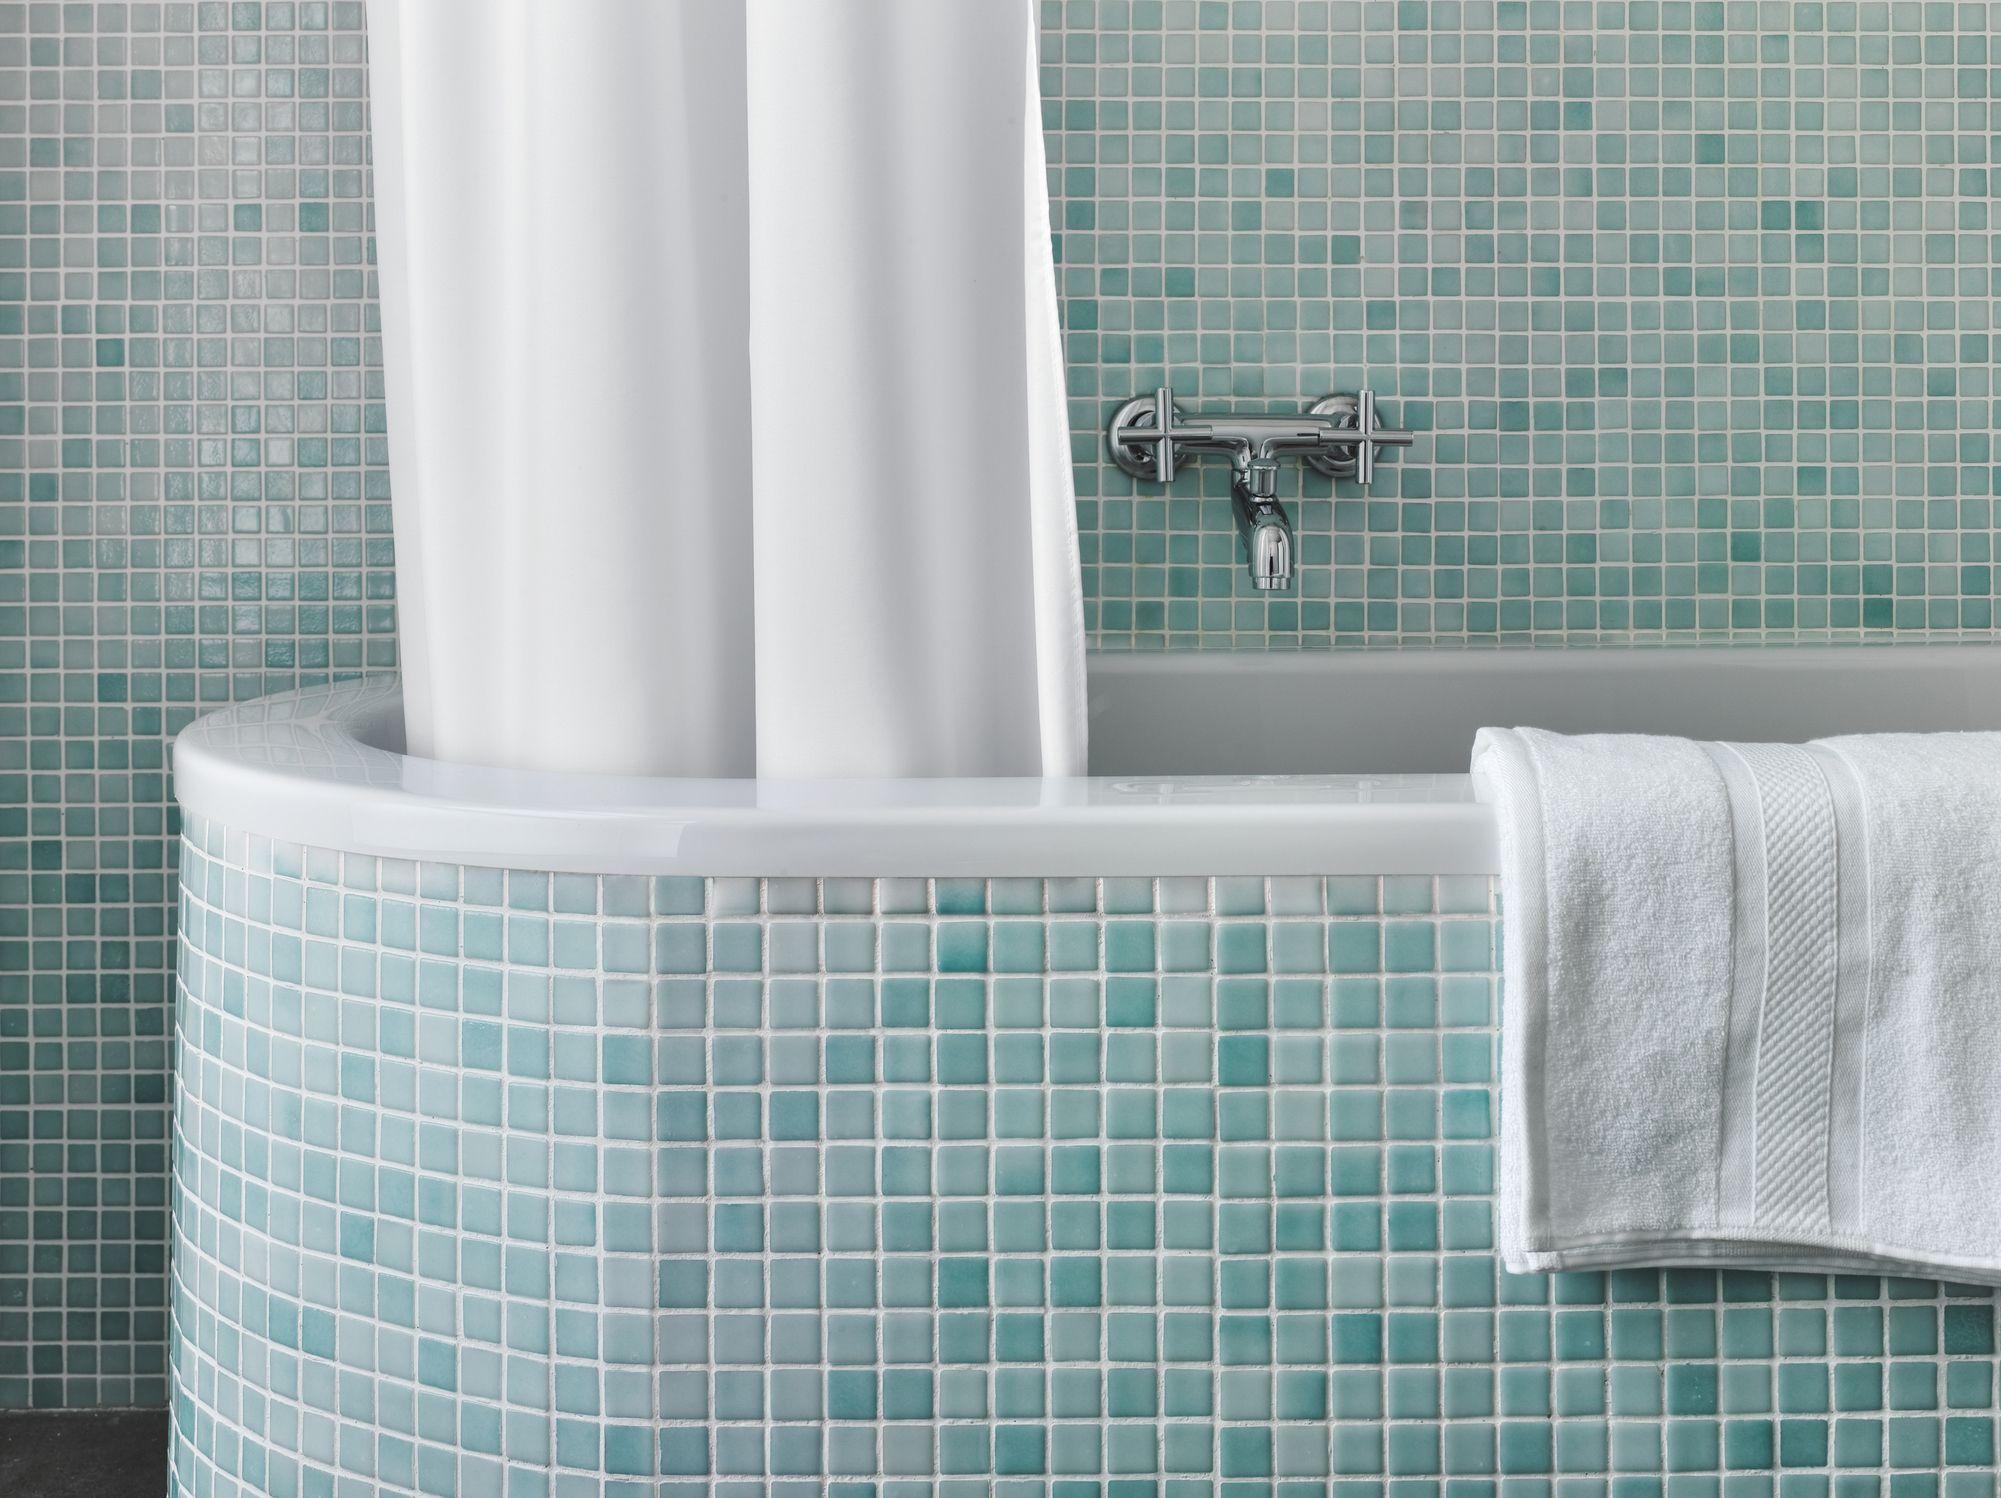 Bathroom Shower Wall Tiles